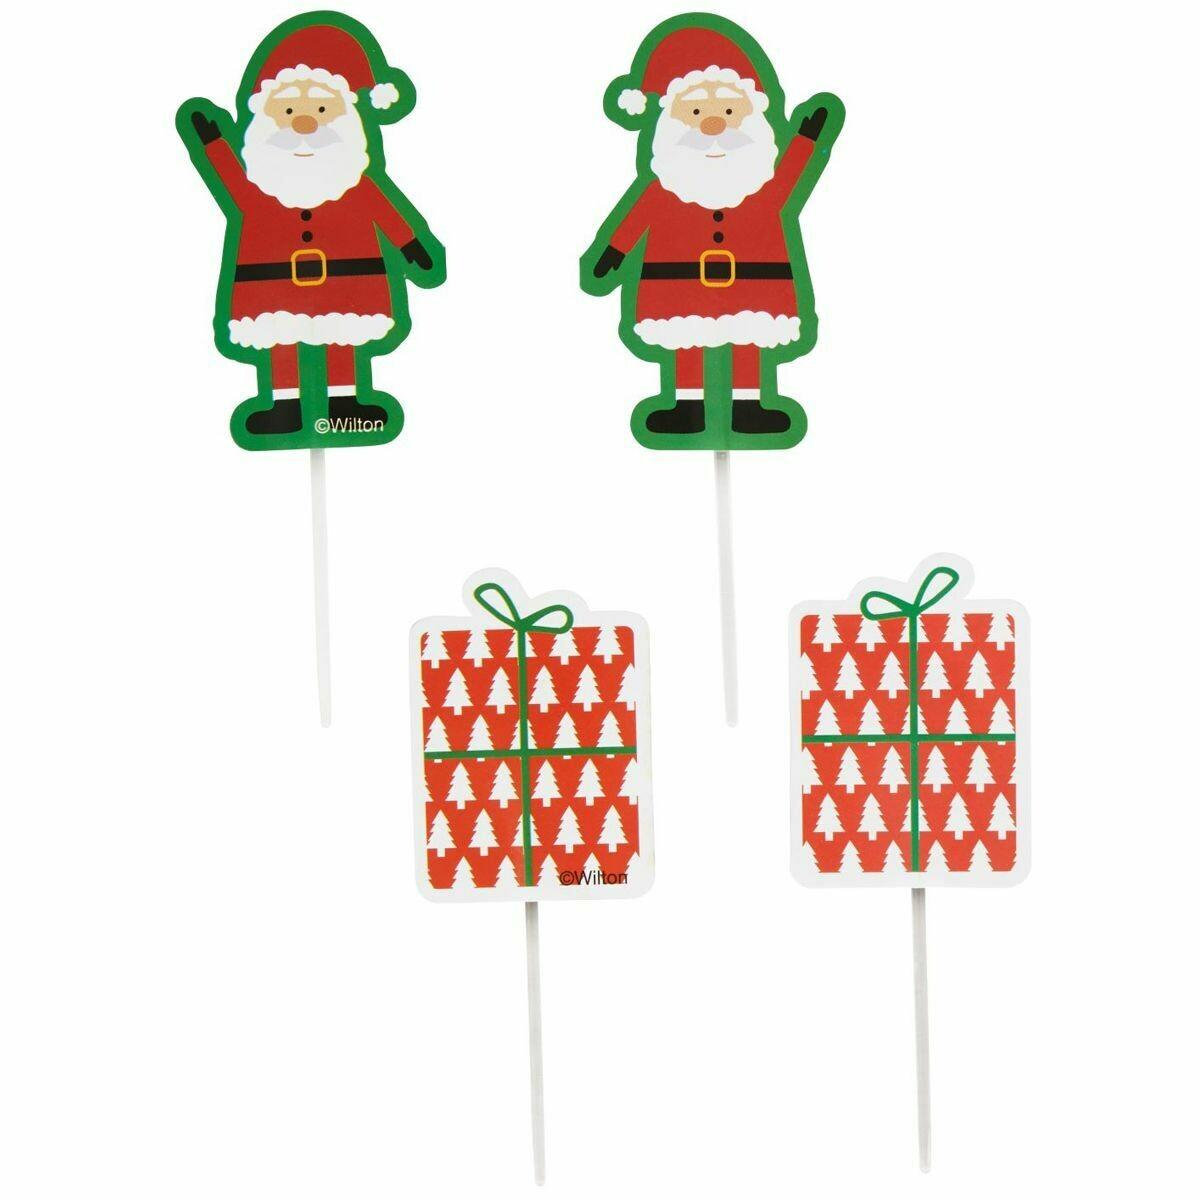 SALE!!! Wilton Treat Picks Santa Claus -12τεμ - Σετ 12τεμ Χριστουγεννιάτικα Τόπερ Άγιος Βασίλης και Δώρα